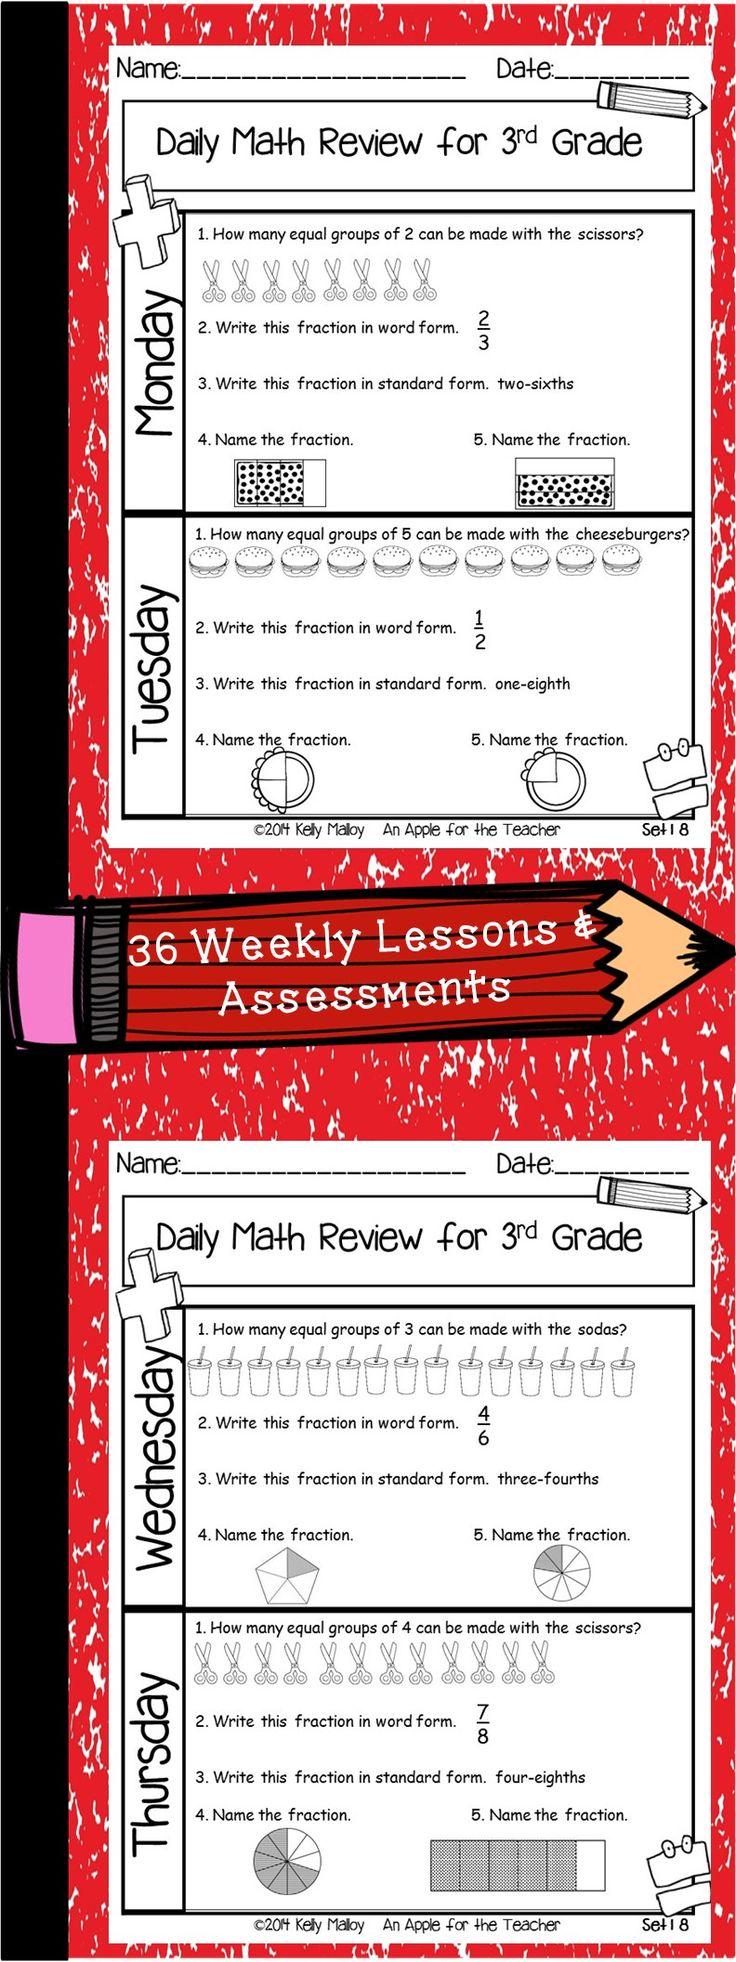 Best 25 daily math ideas on pinterest year 5 maths worksheets daily math review third grade spiral math review falaconquin